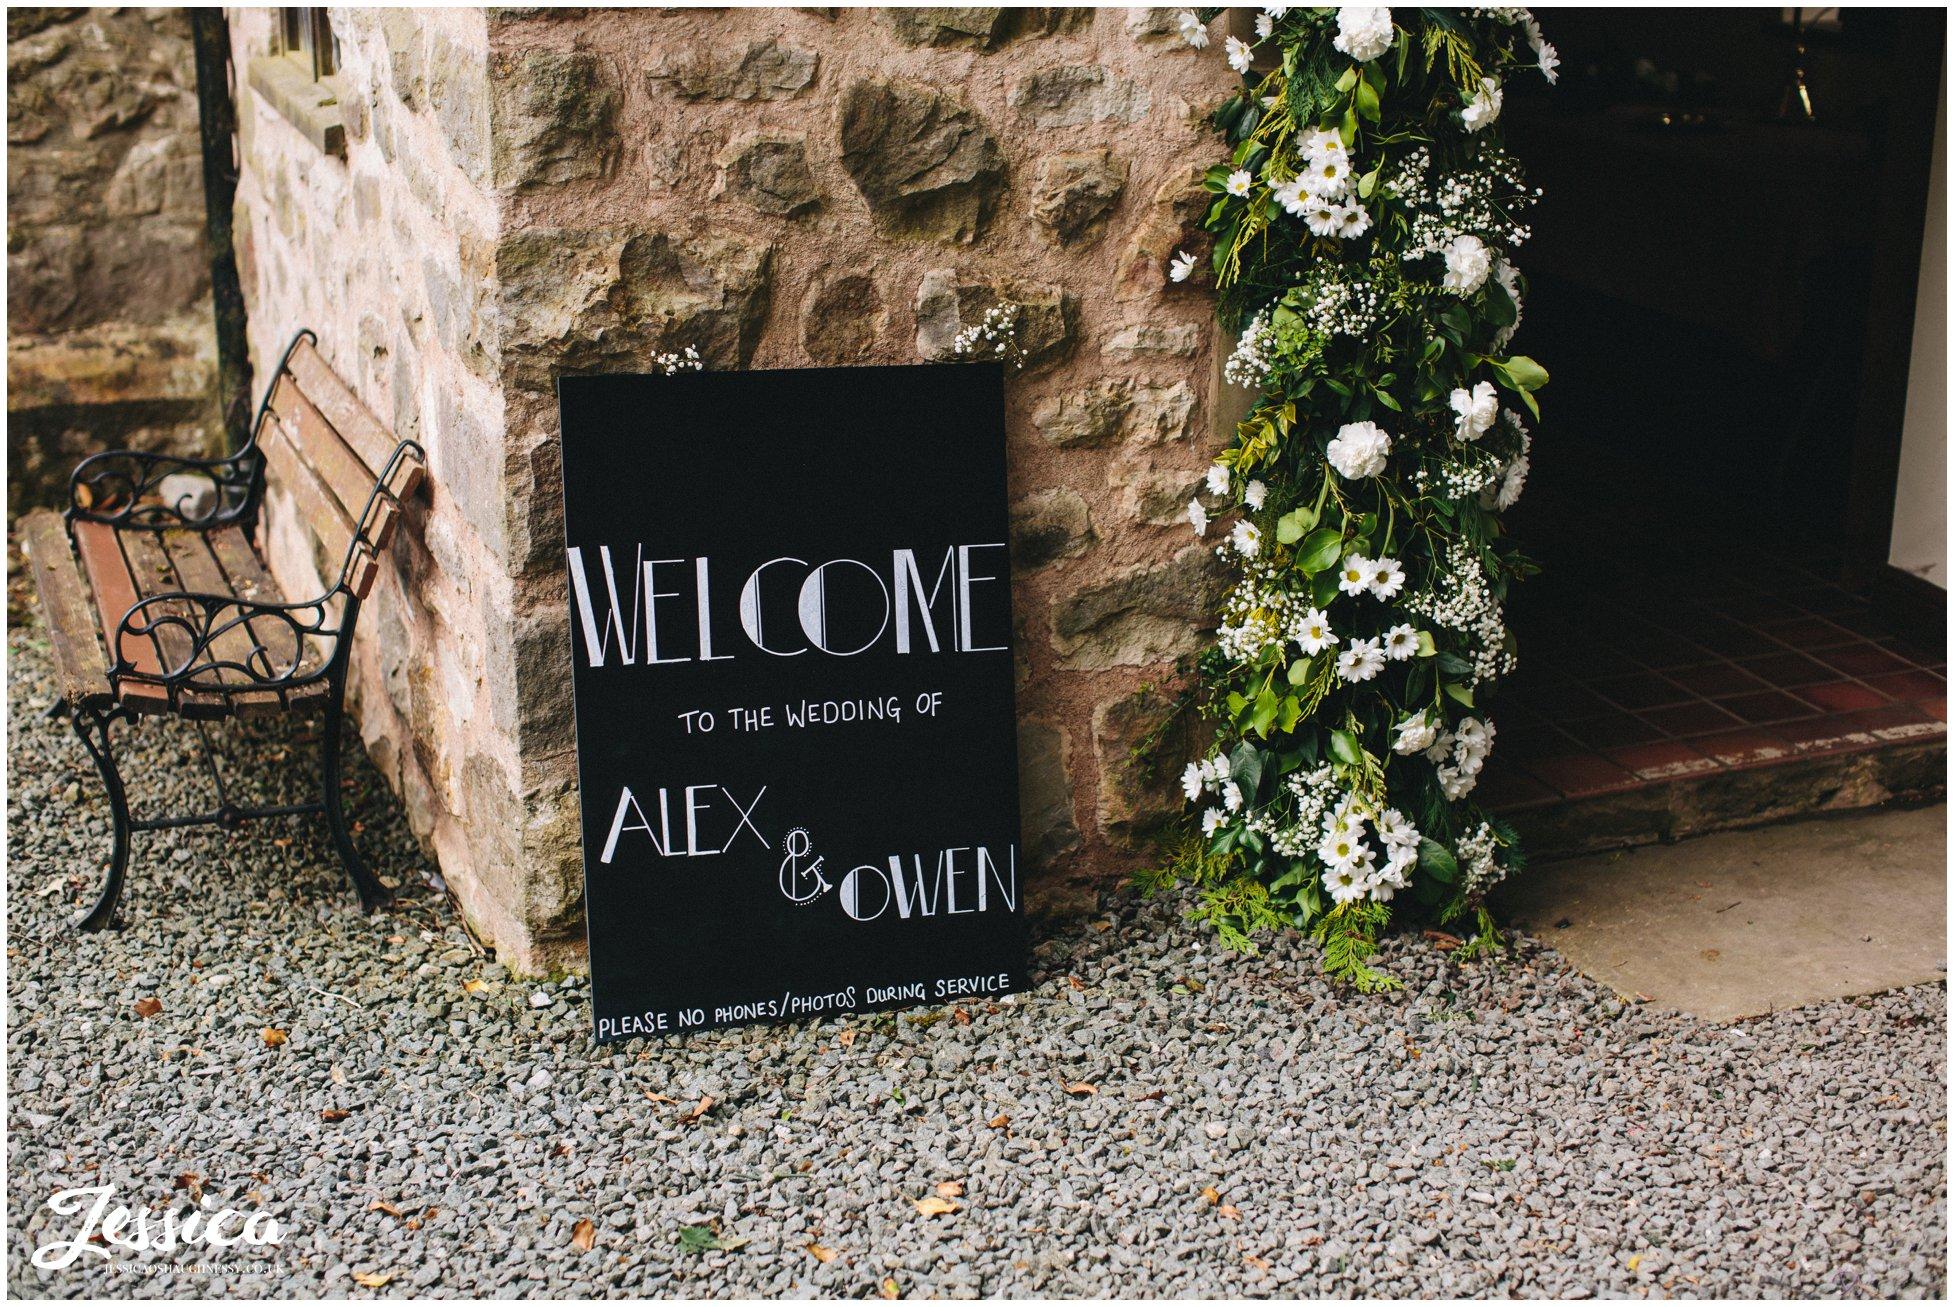 Alex & owen's wedding sign outside Trevor Church in North wales